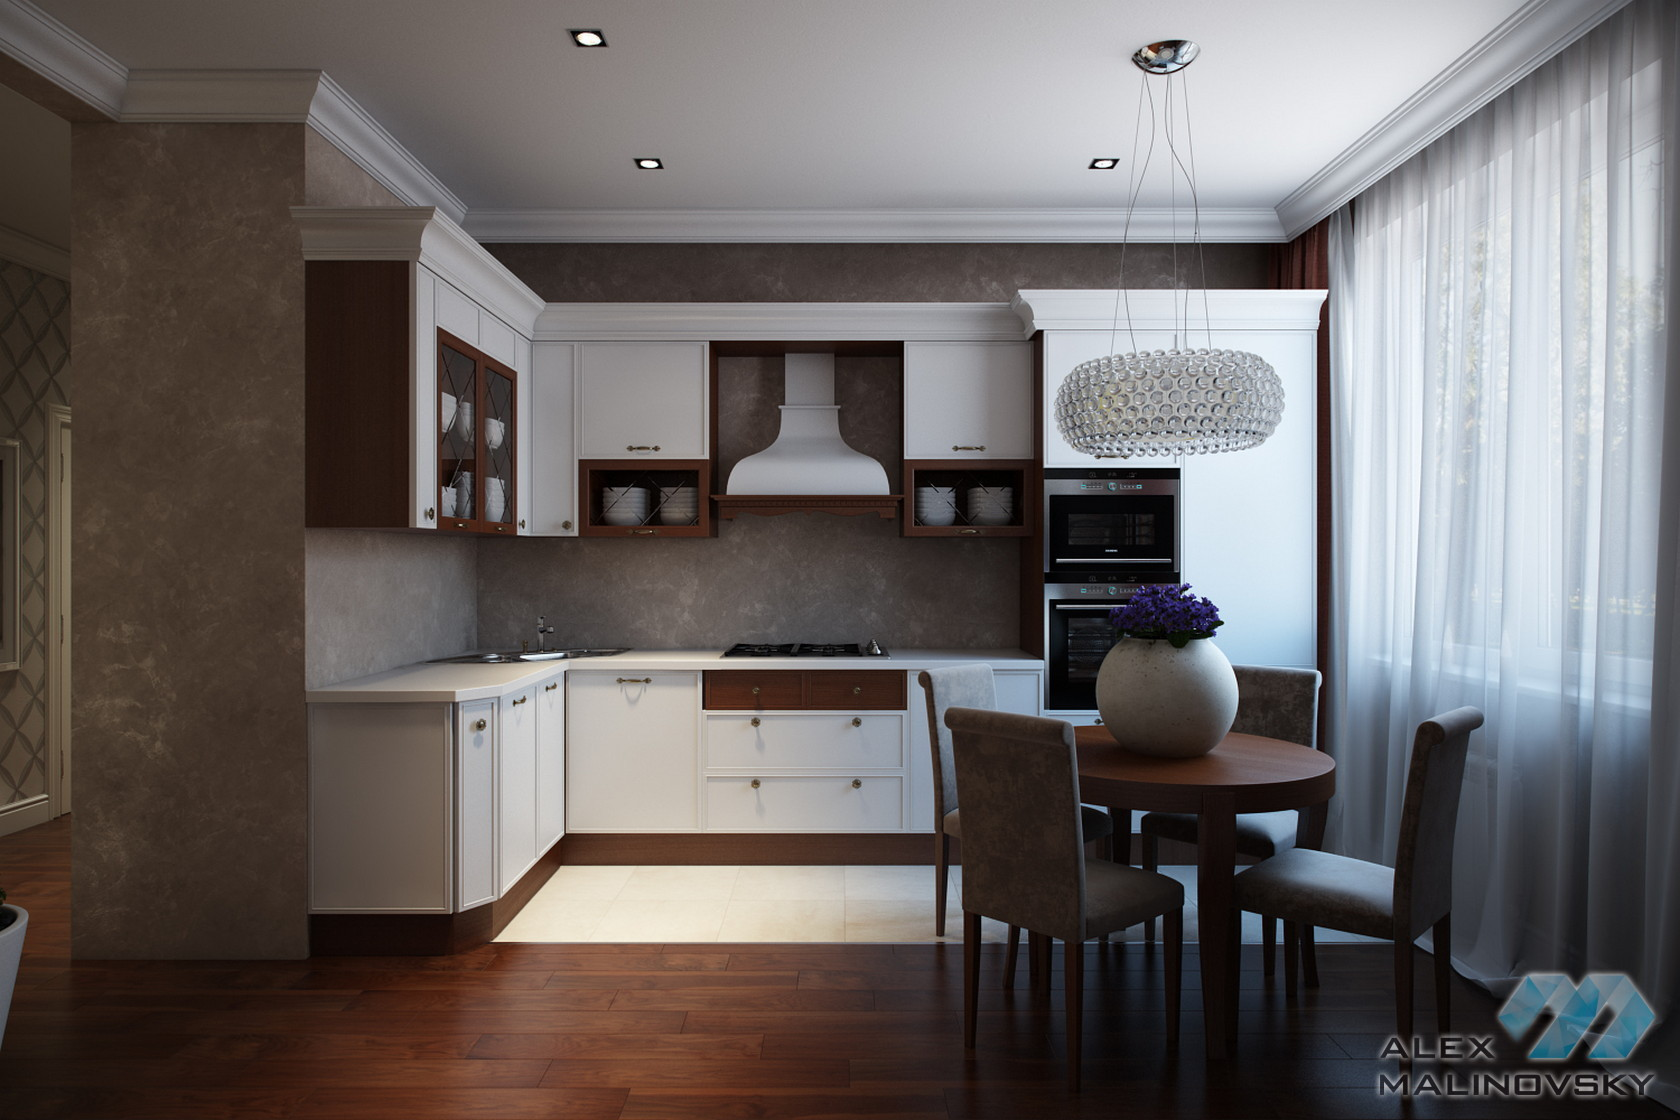 Кухня, 3х комнатная квартира, ул. Веерная, Москва